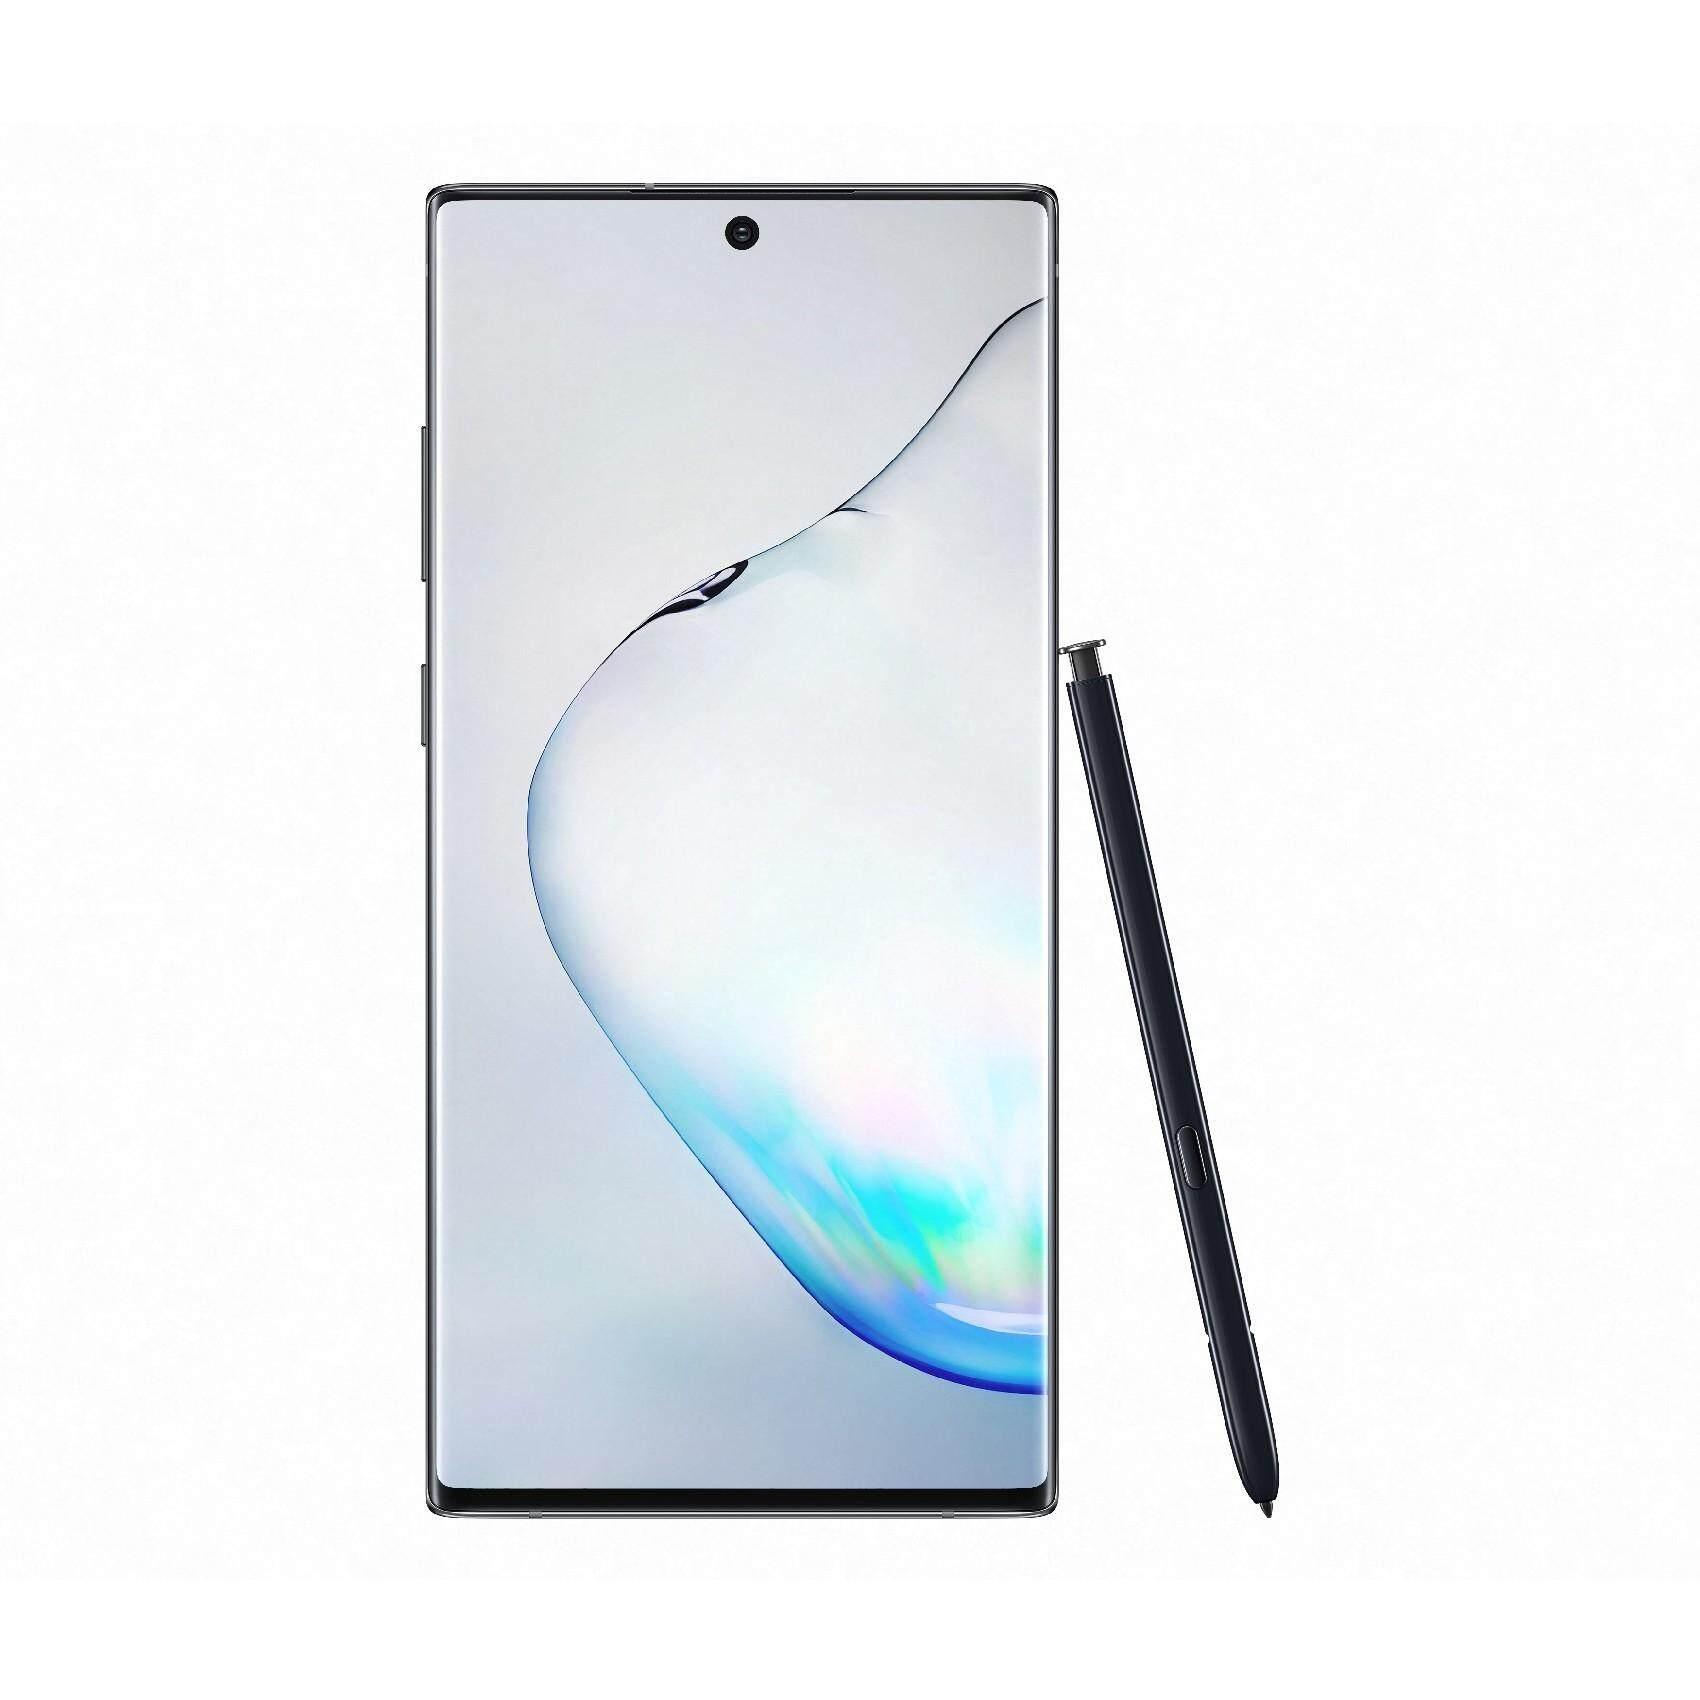 (Pre-Order) Samsung Galaxy Note 10+ รับสิทธิ์ Upgrade memory to 12/512GB (สินค้าจะจัดส่งตั้งแต่ วันที่ 22 ส.ค เป็นต้นไป) samsung - เปิดตัวแล้ว Samsung Galaxy Note 10 Series จอแจ่ม กล้องดี ชาร์จเร็วทันใจ พร้อมฟีเจอร์ใหม่ Air Gesture